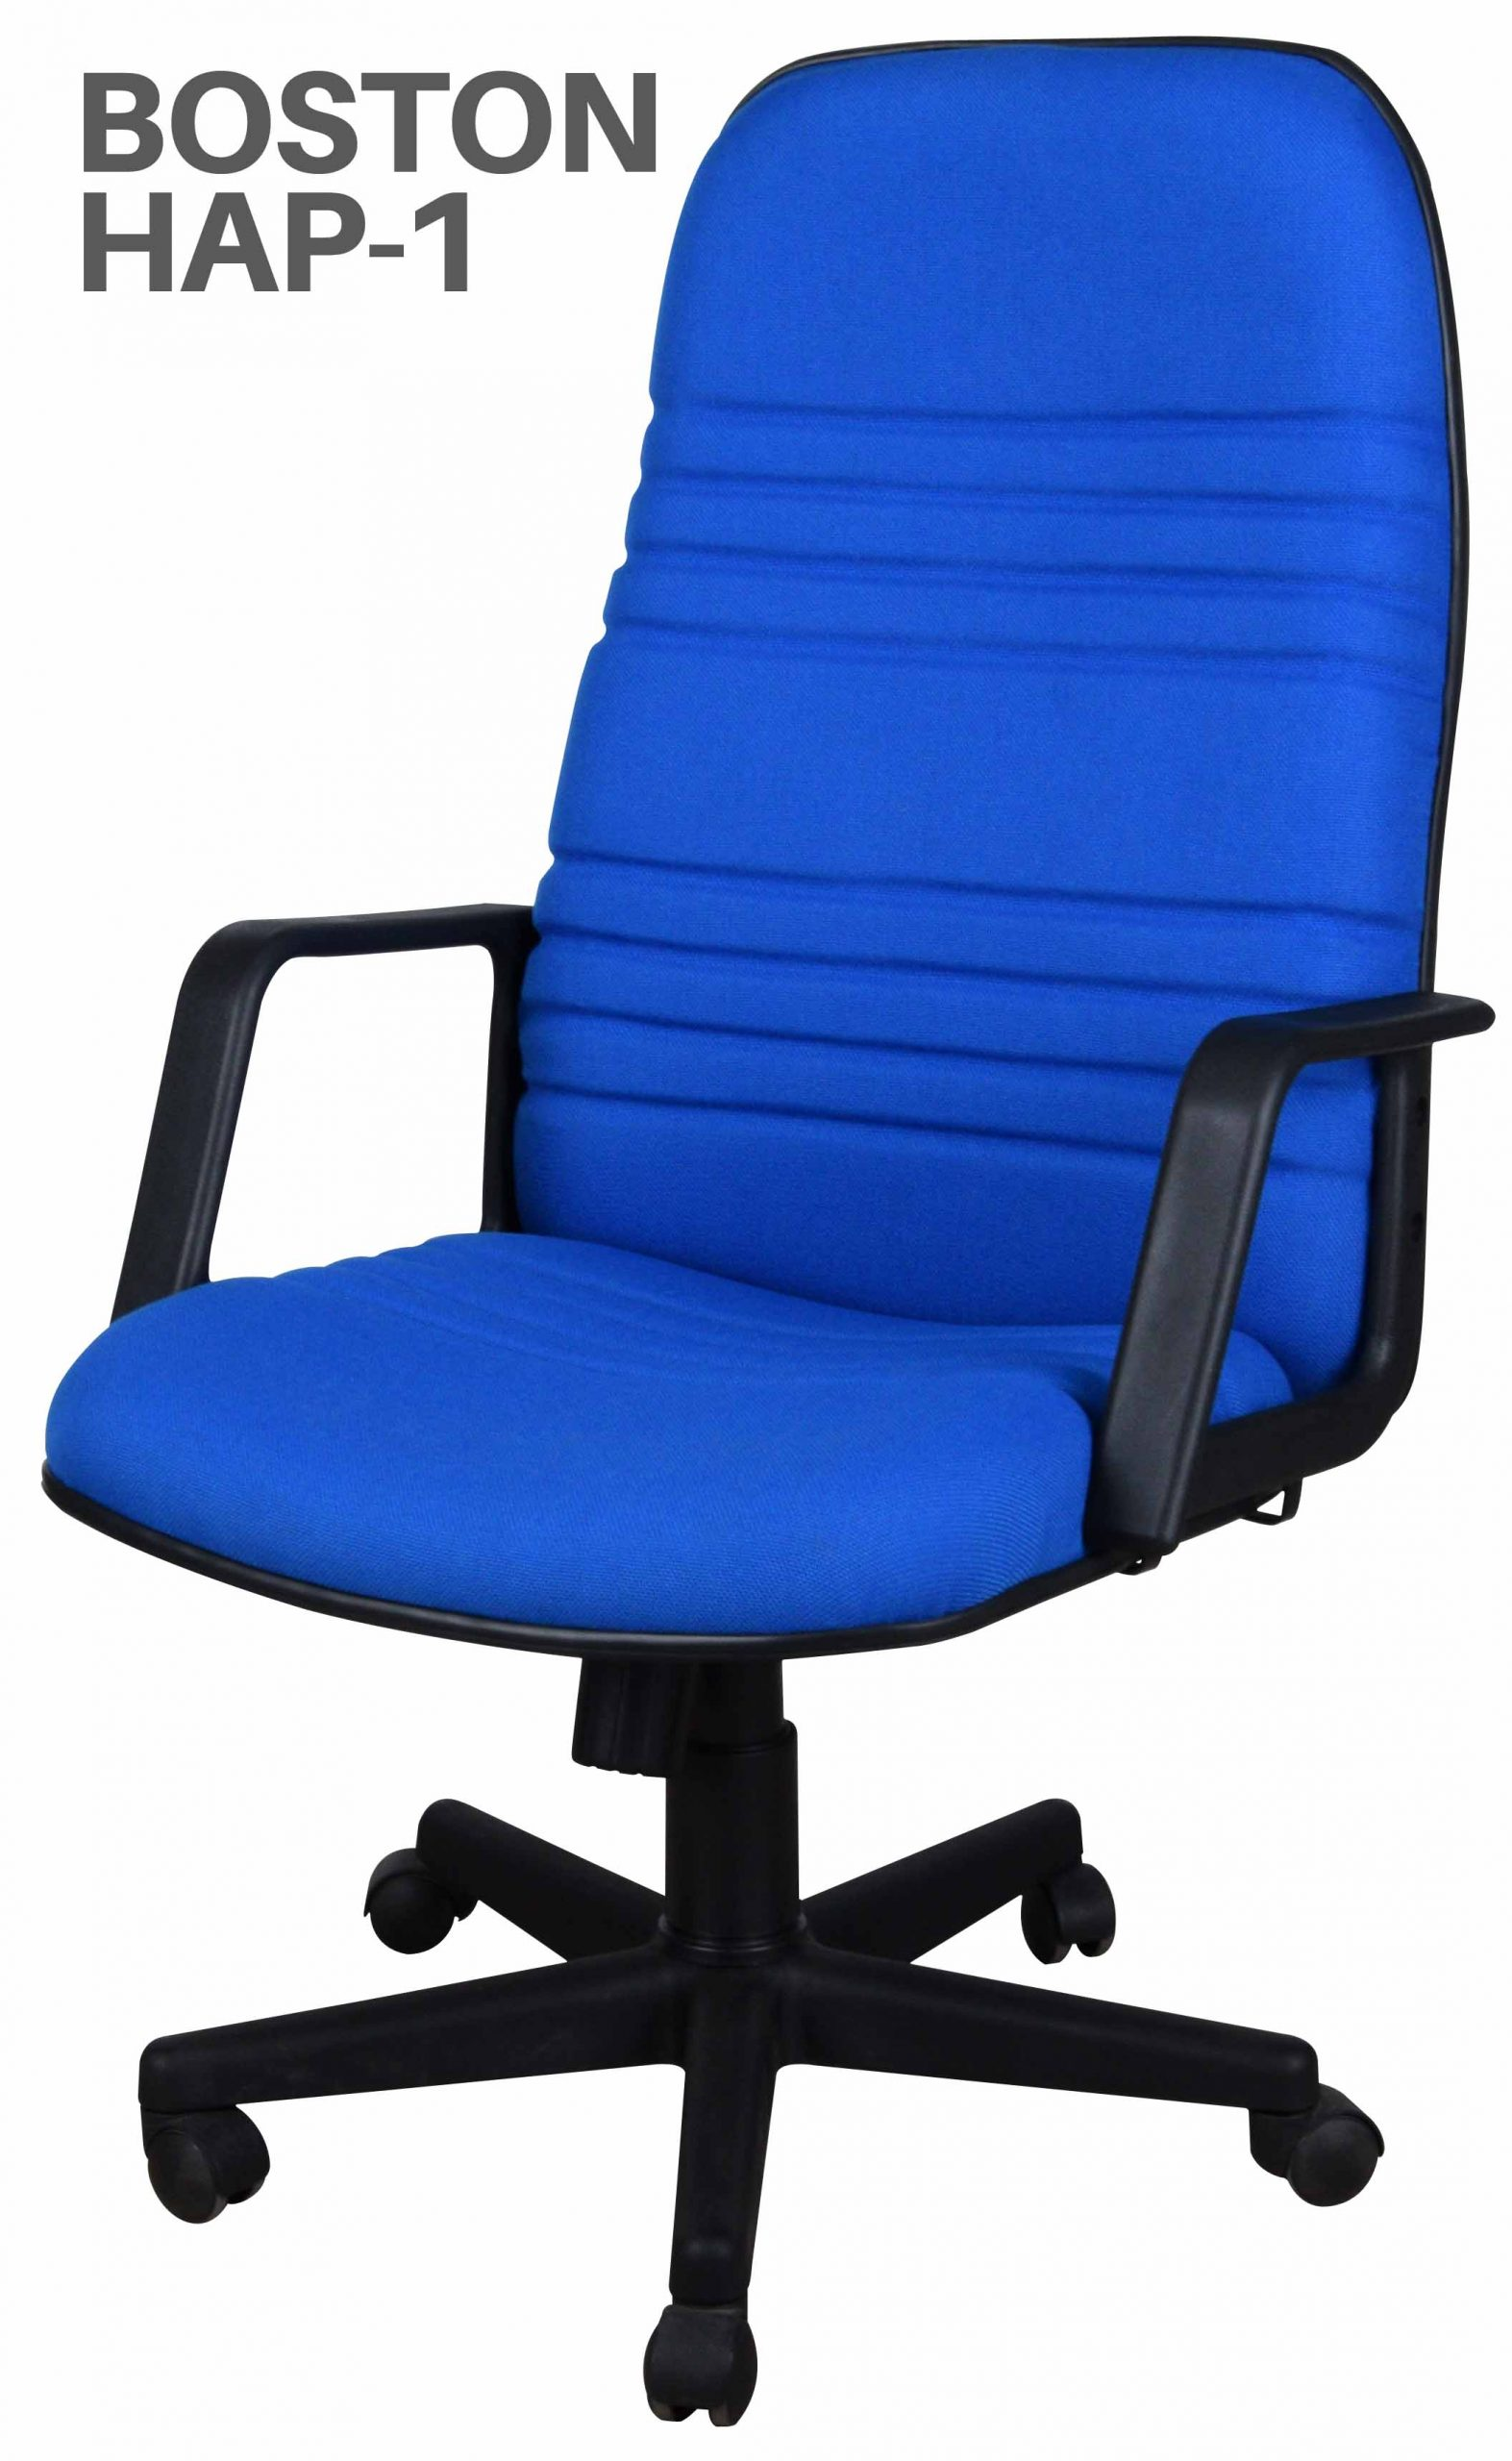 Agen Jual Kursi Kantor Uno Di Cibinong Archives Manara Furniture